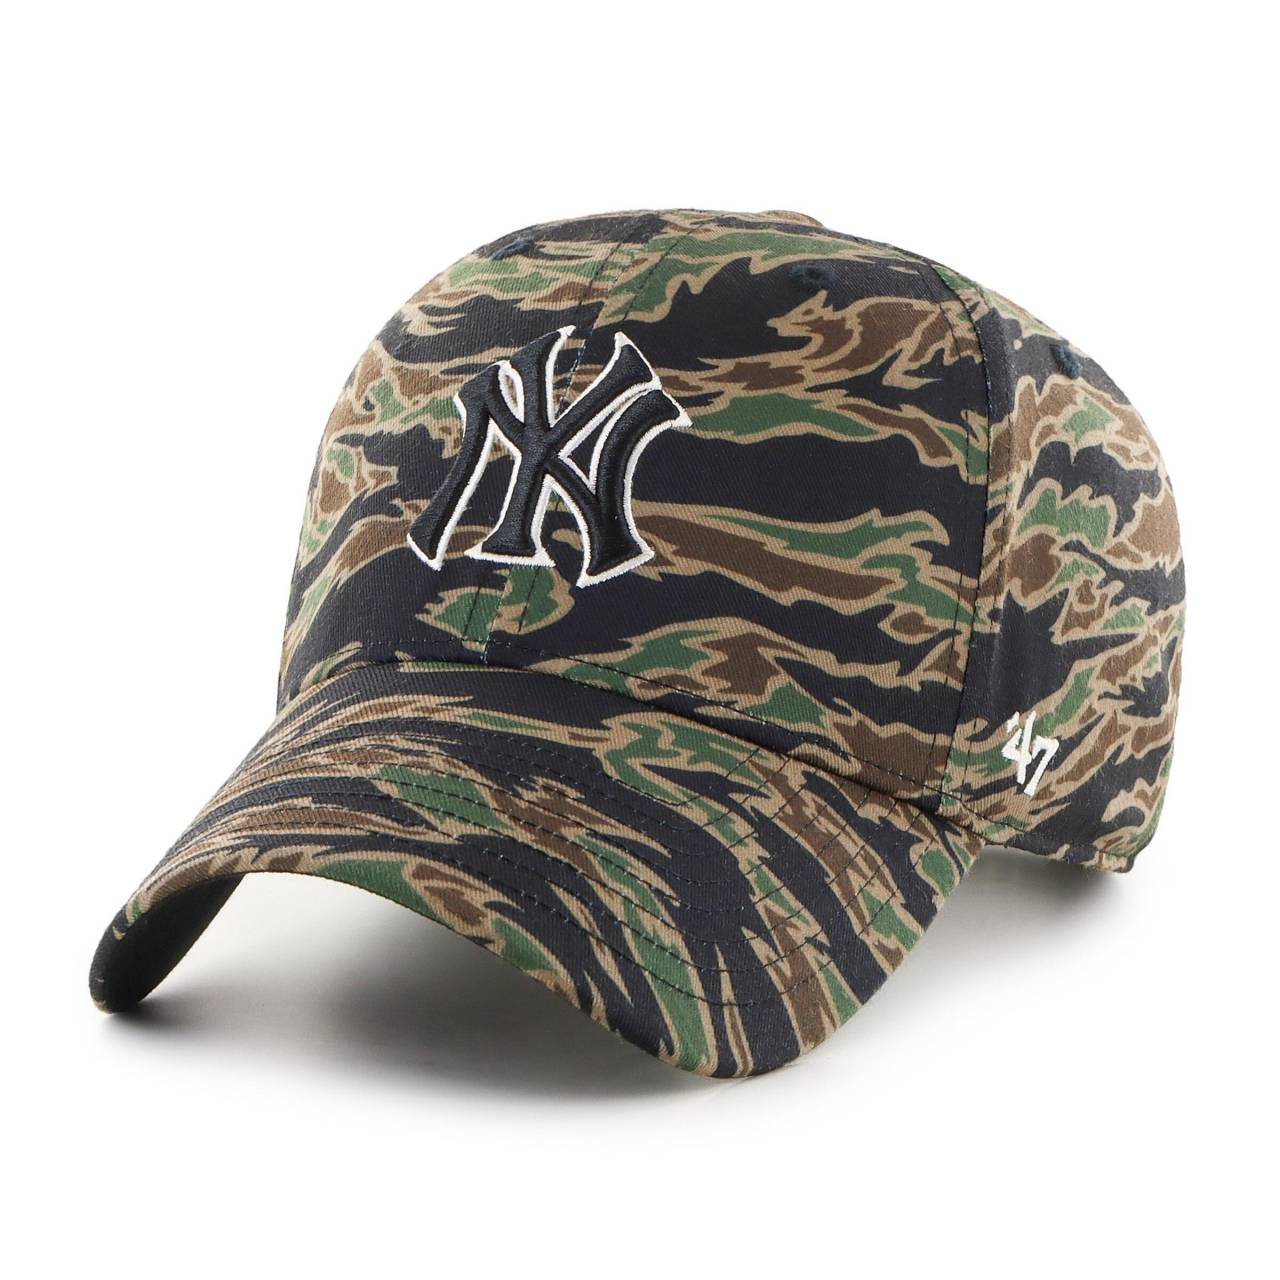 MLB NEW YORK YANKEES DROP ZONE '47 MVP TIGER CAMO